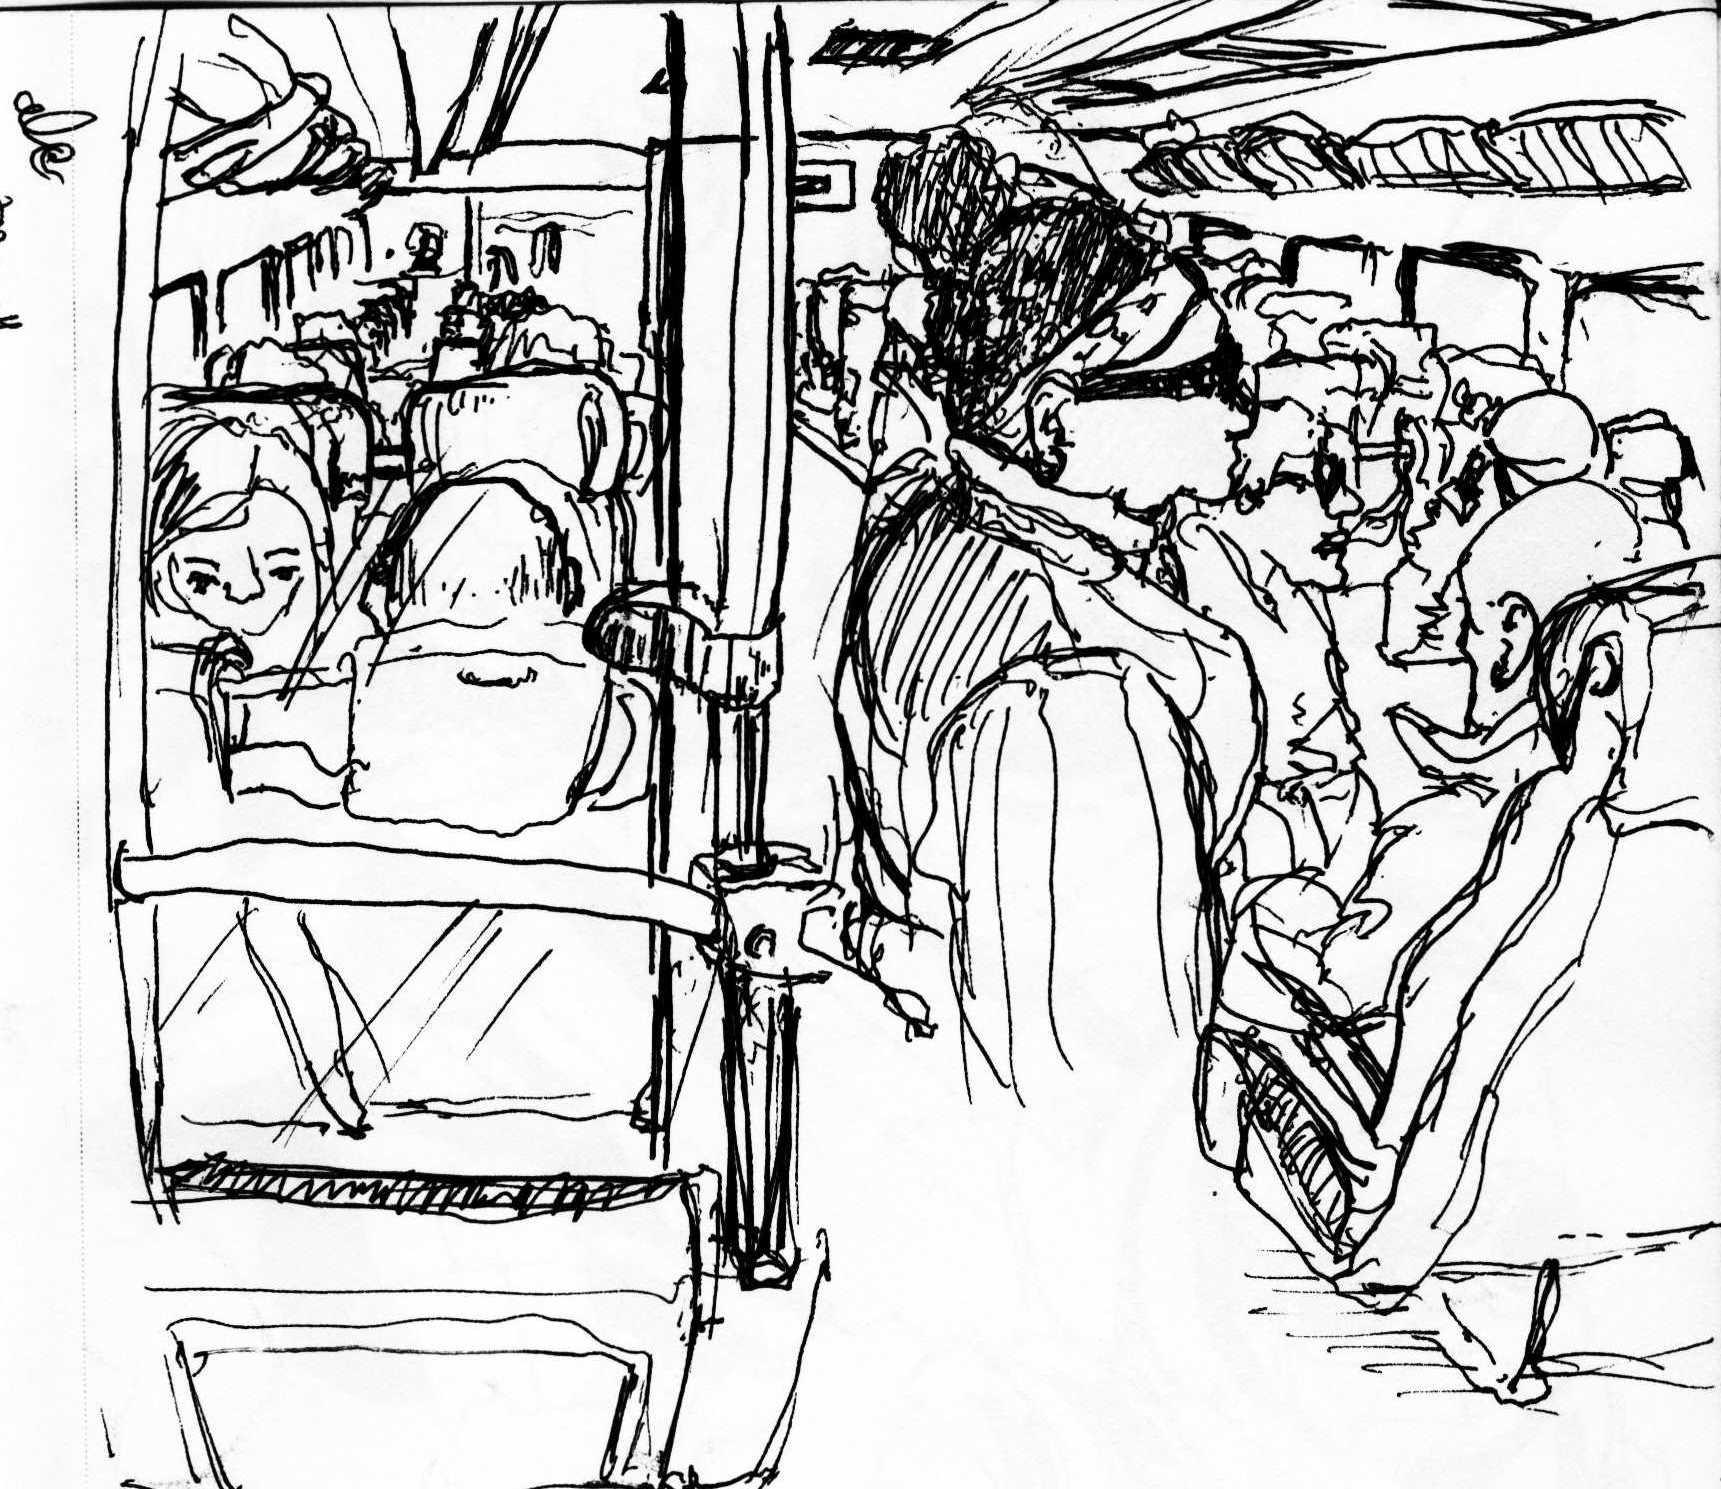 Train Rail Drawing At Getdrawings